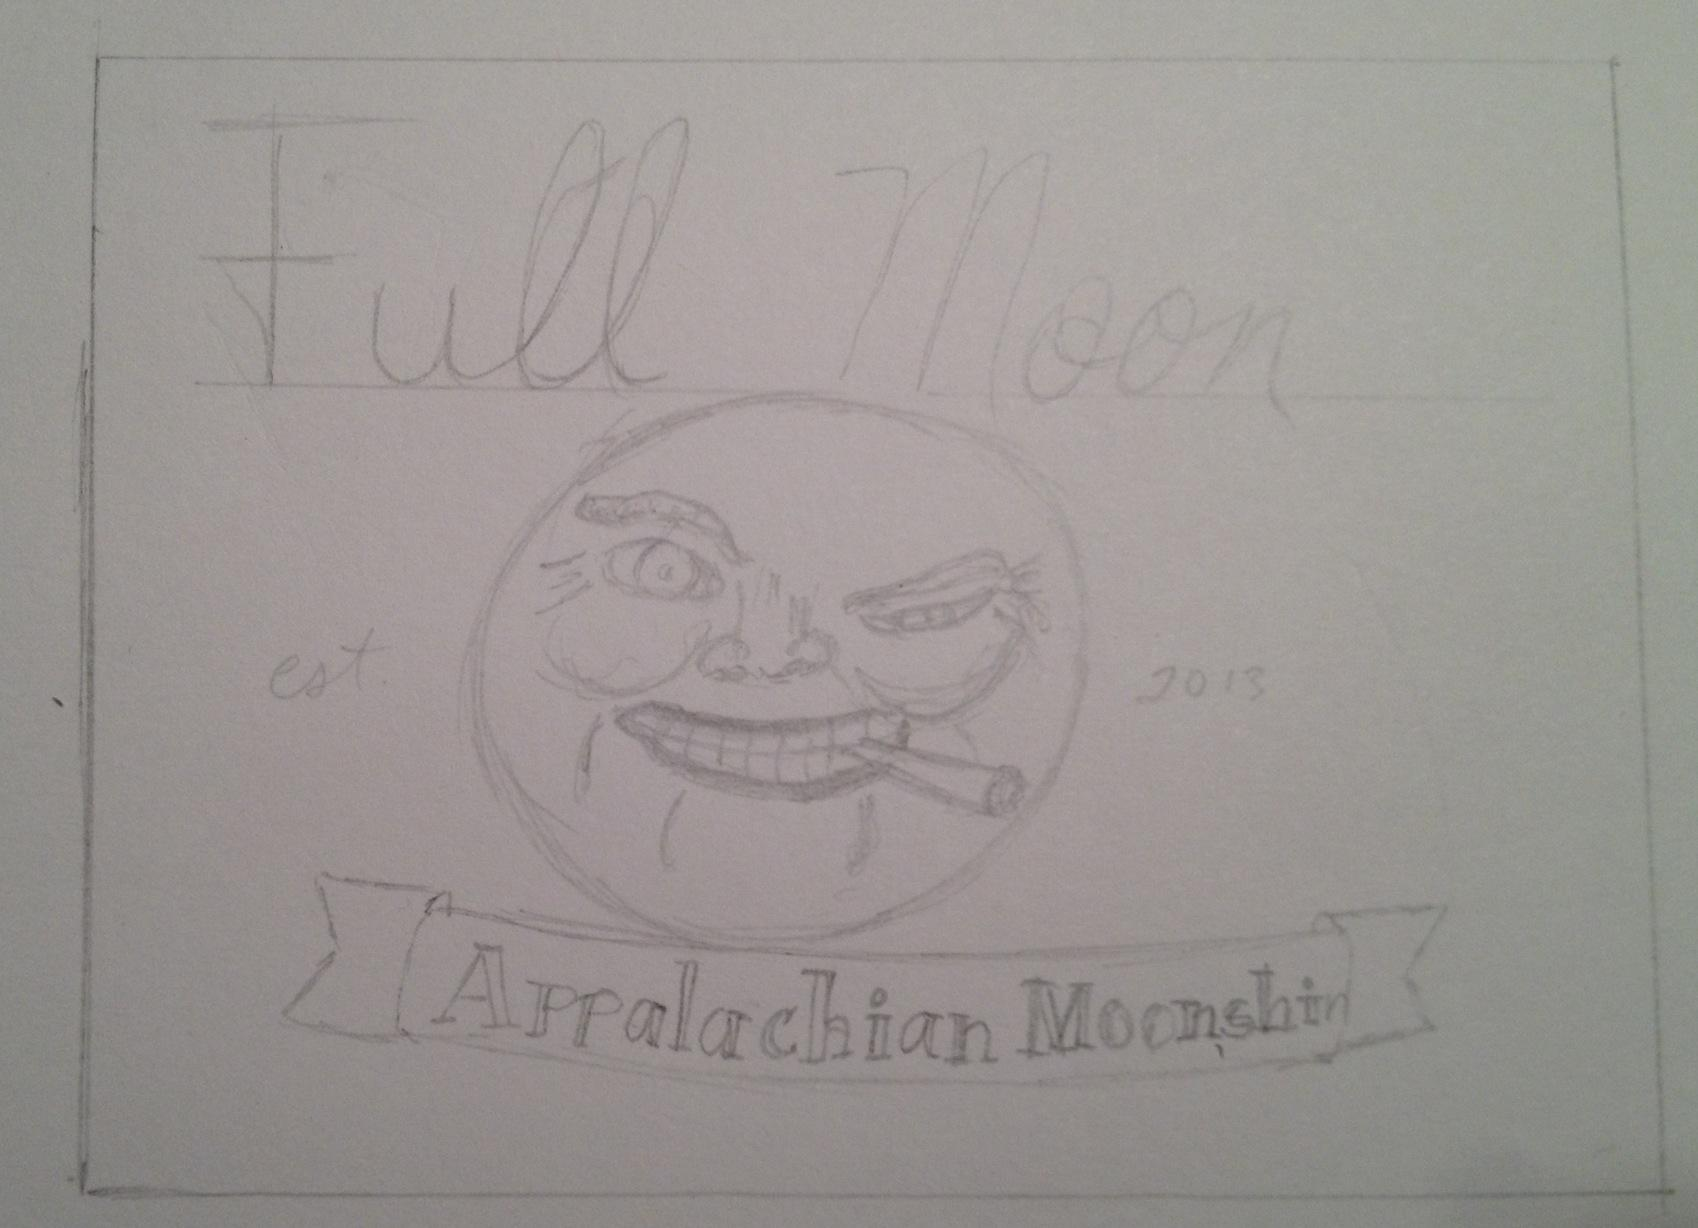 Full Moon Appalachian Moonshine - image 6 - student project